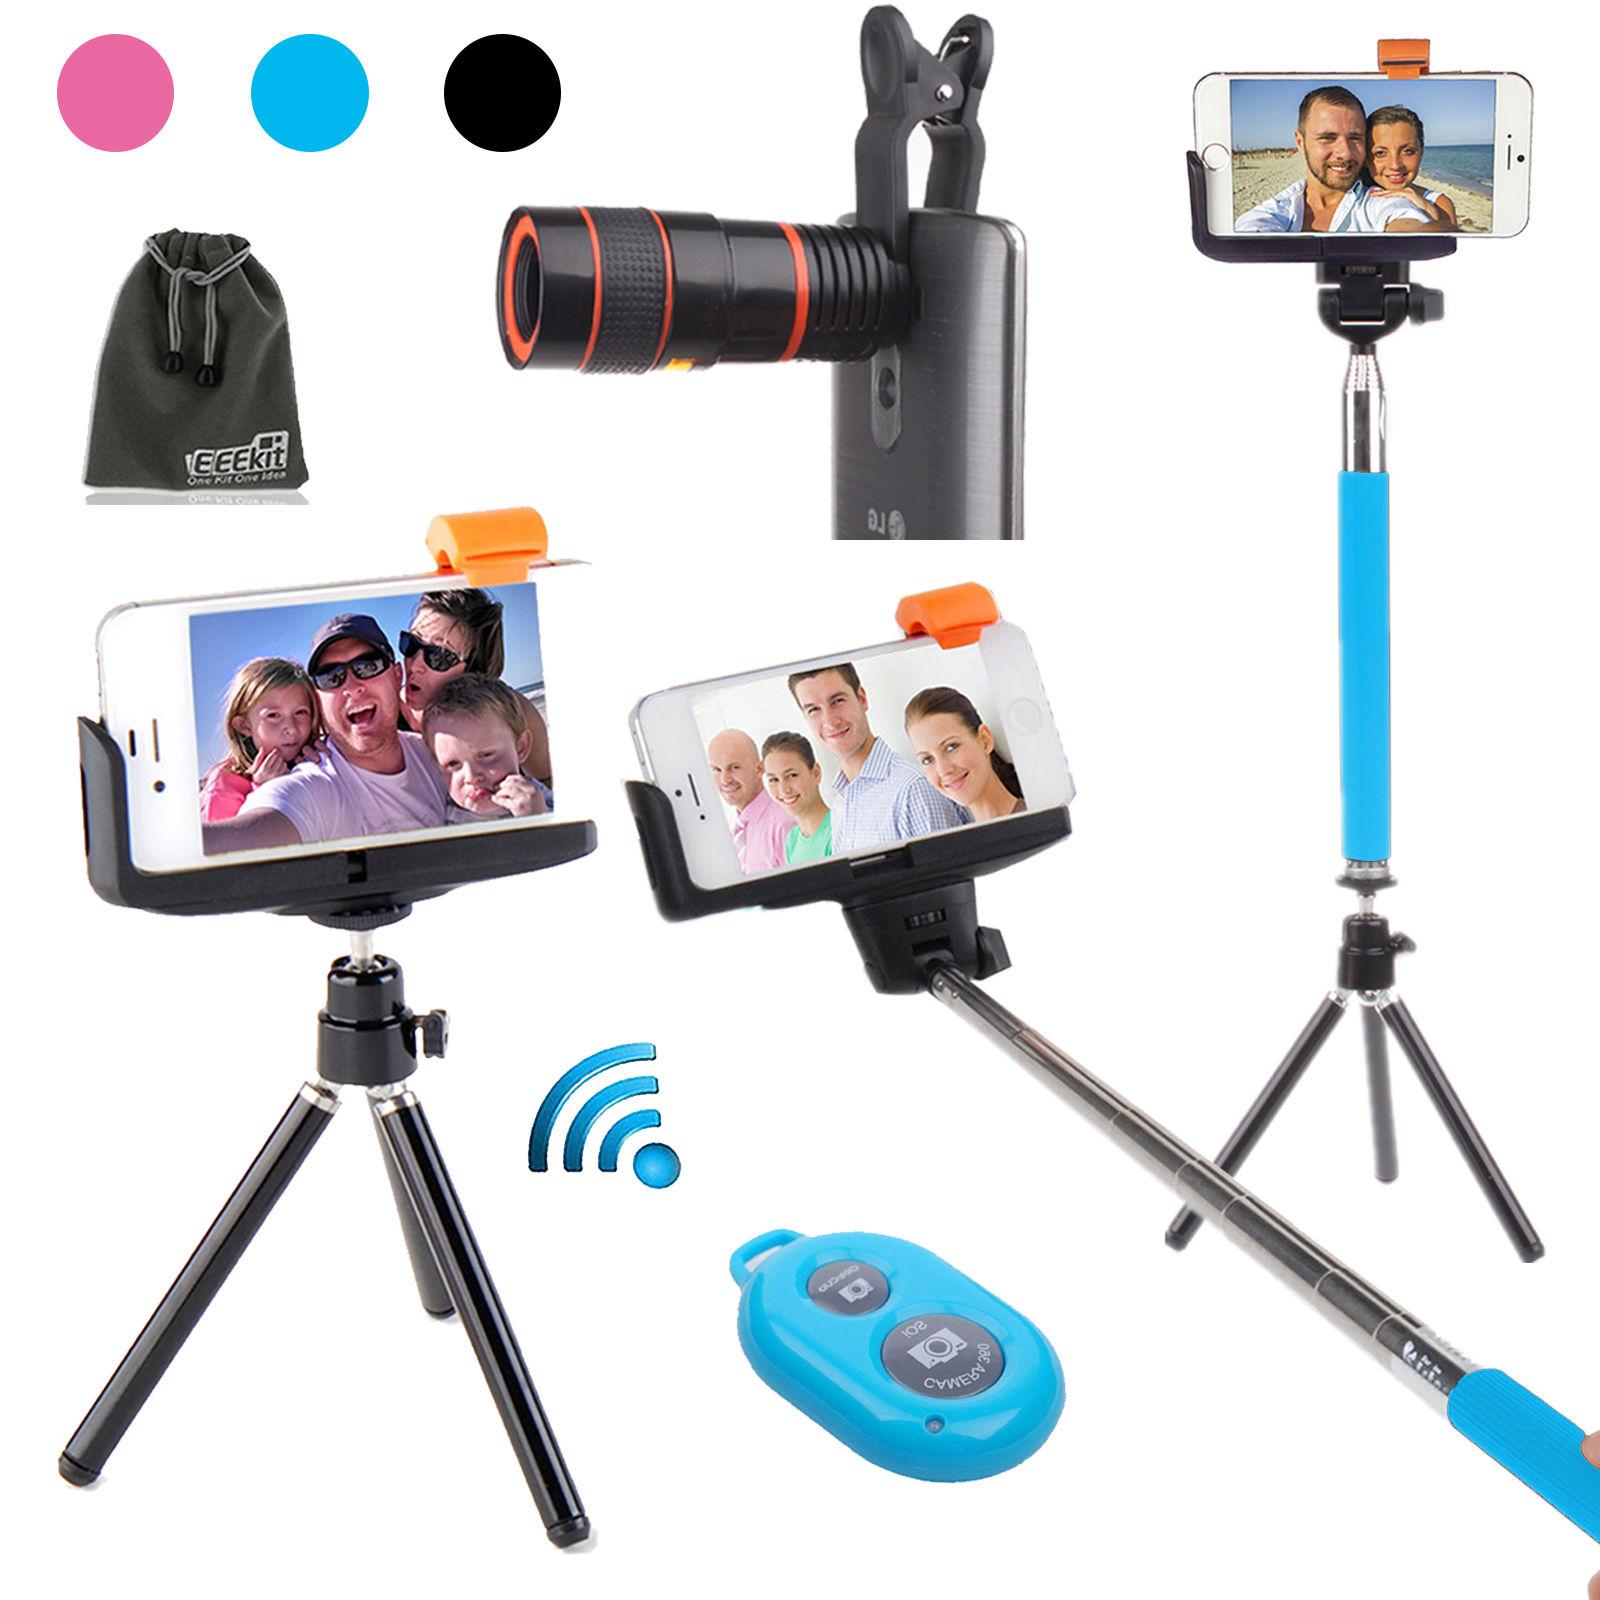 8x zoom lens telescope tripod selfie stick remote shutter for samsung iphone lg ebay. Black Bedroom Furniture Sets. Home Design Ideas